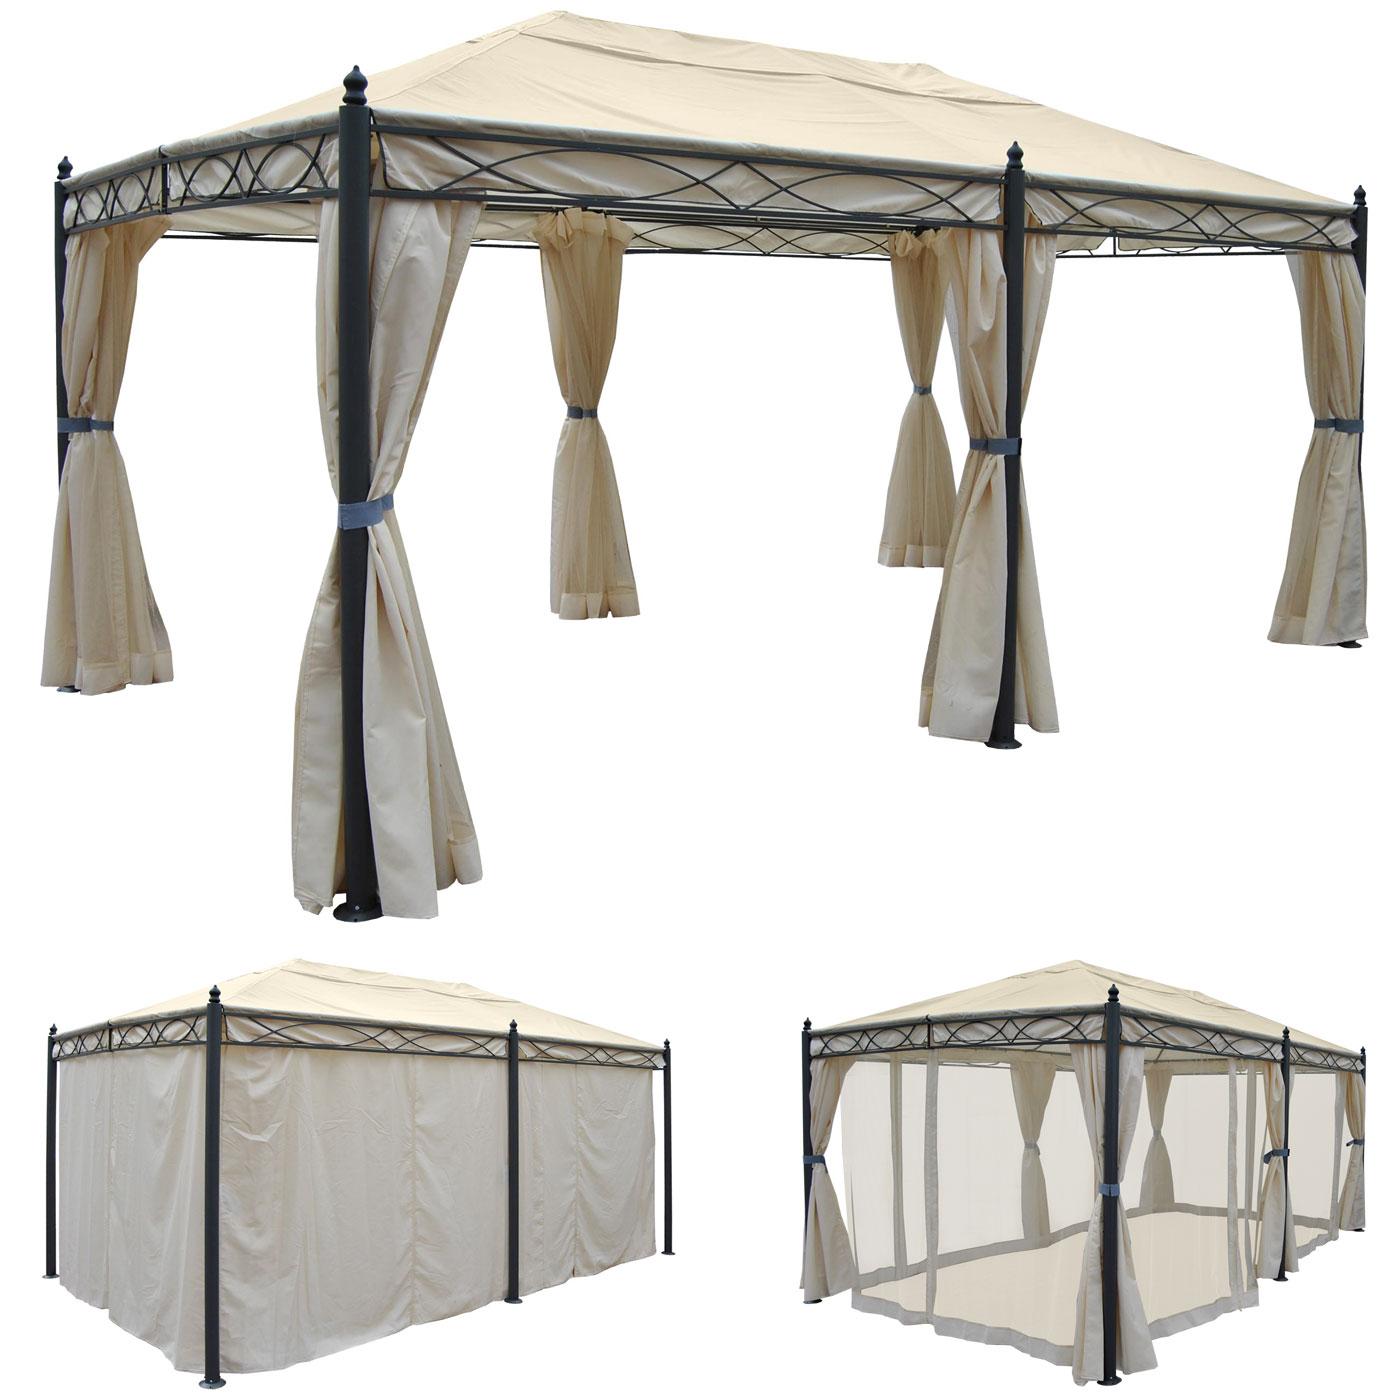 pavillon 3 5x3 5 wasserdicht luxus pavillon gartenzelt. Black Bedroom Furniture Sets. Home Design Ideas